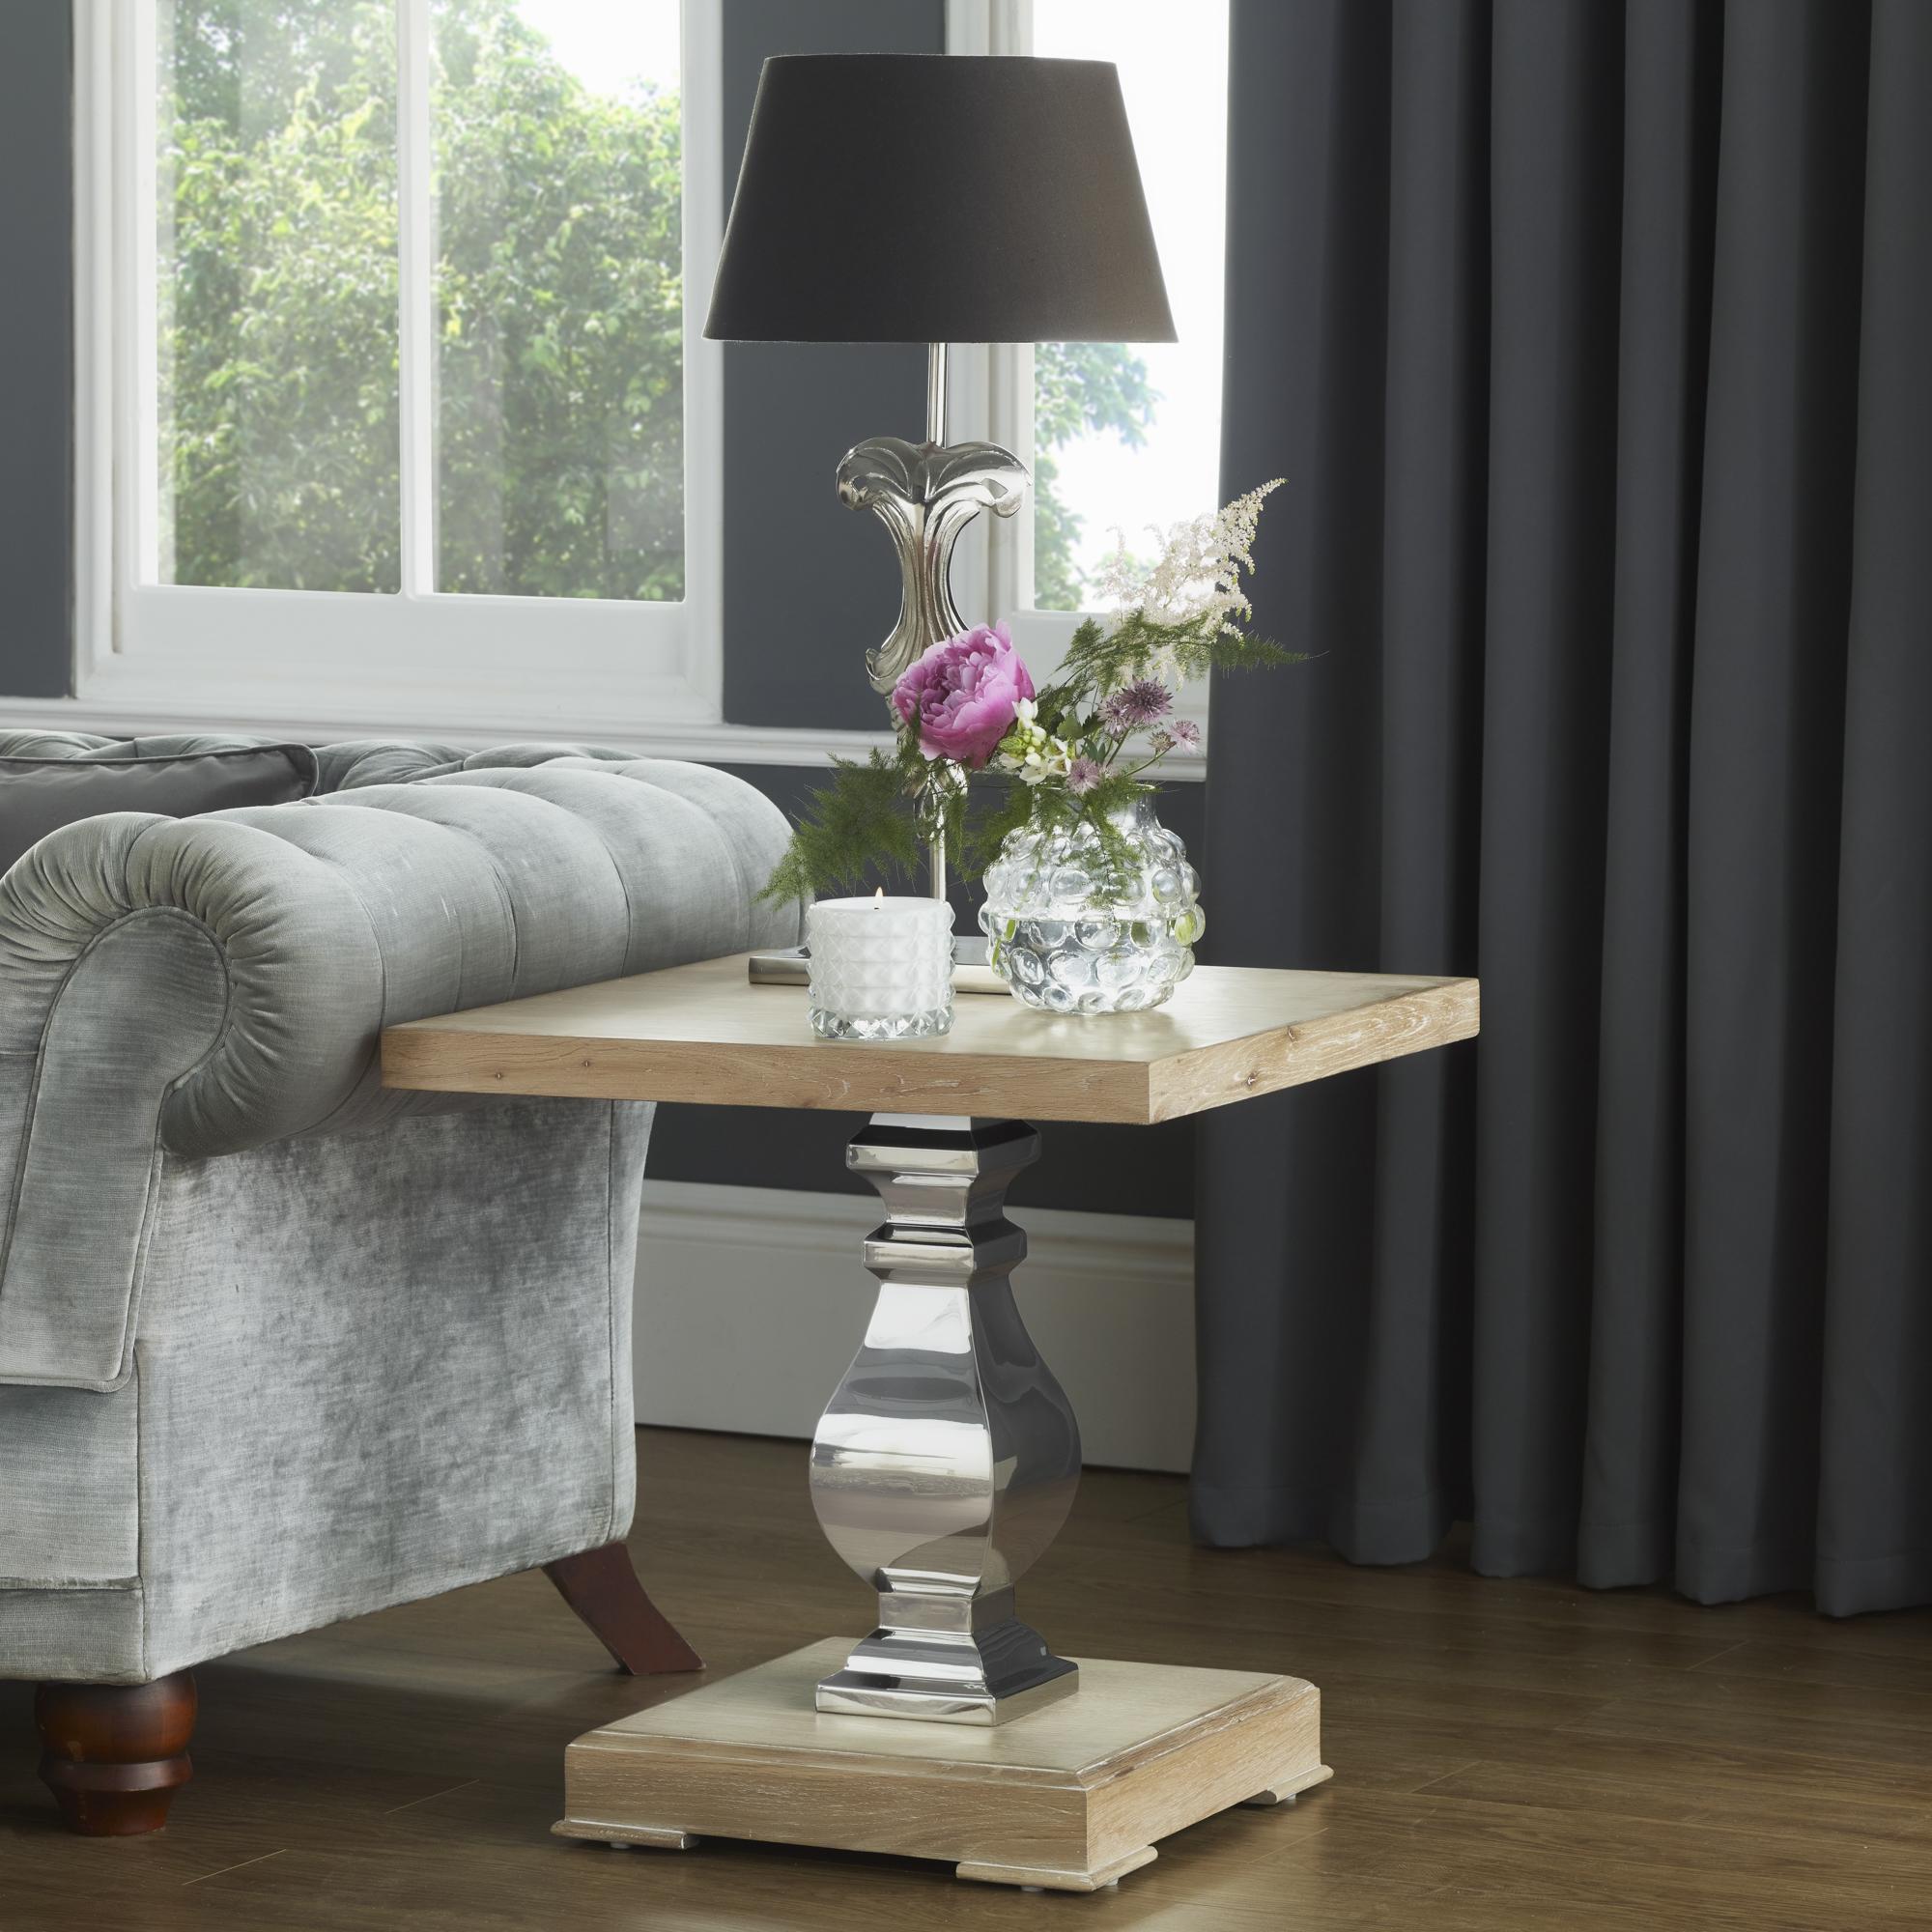 Stainless Steel & Oak Lamp Table